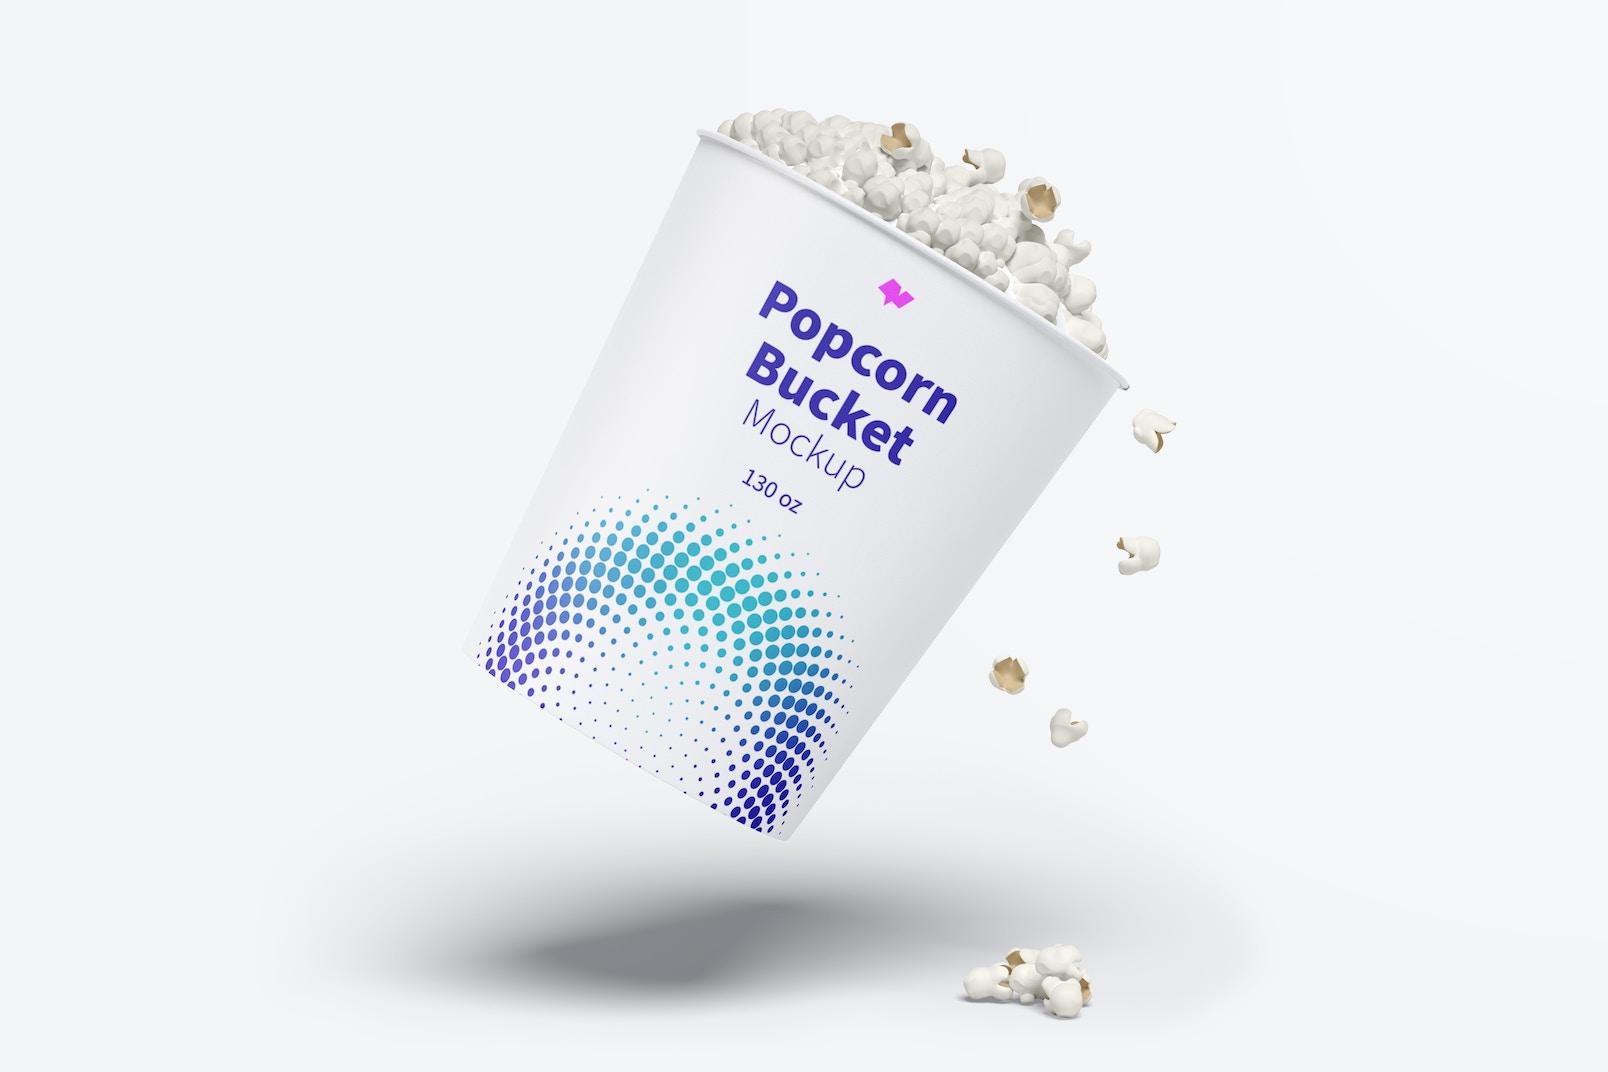 130 oz Popcorn Bucket Mockup, Floating